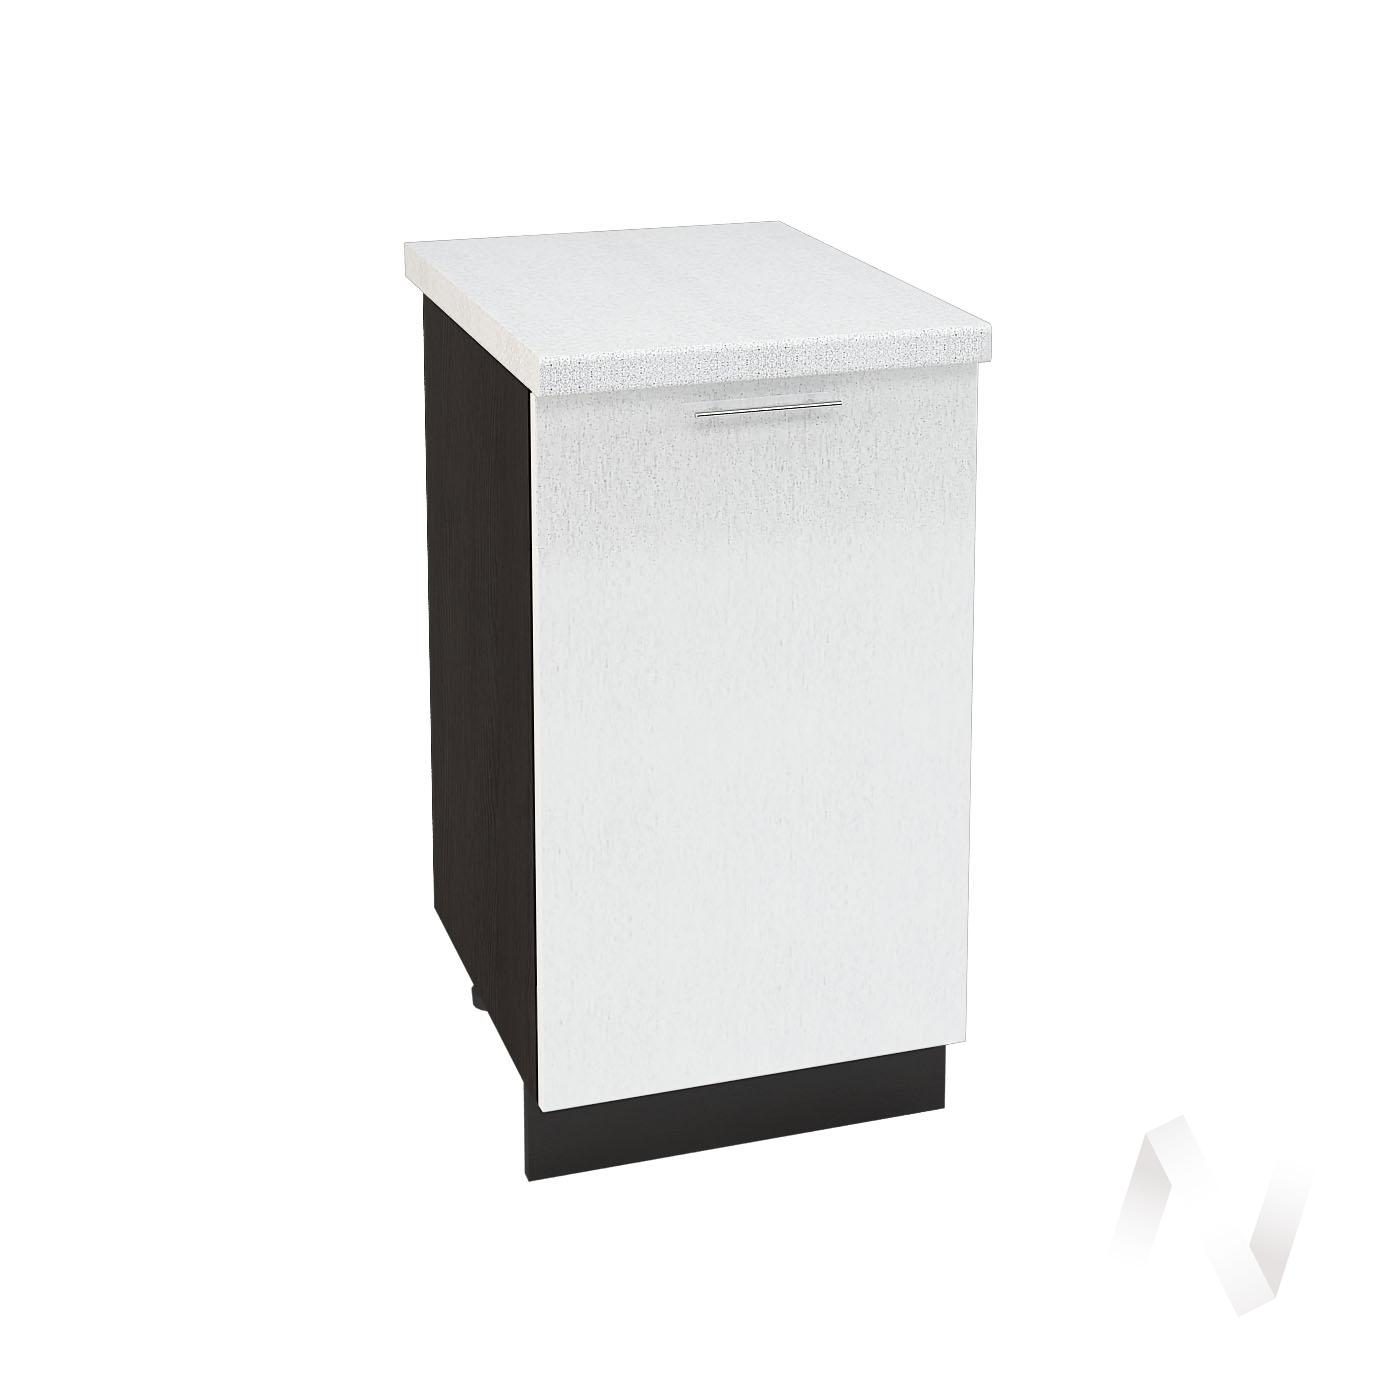 "Кухня ""Валерия-М"": Шкаф нижний 450, ШН 450 (Страйп белый/корпус венге)"